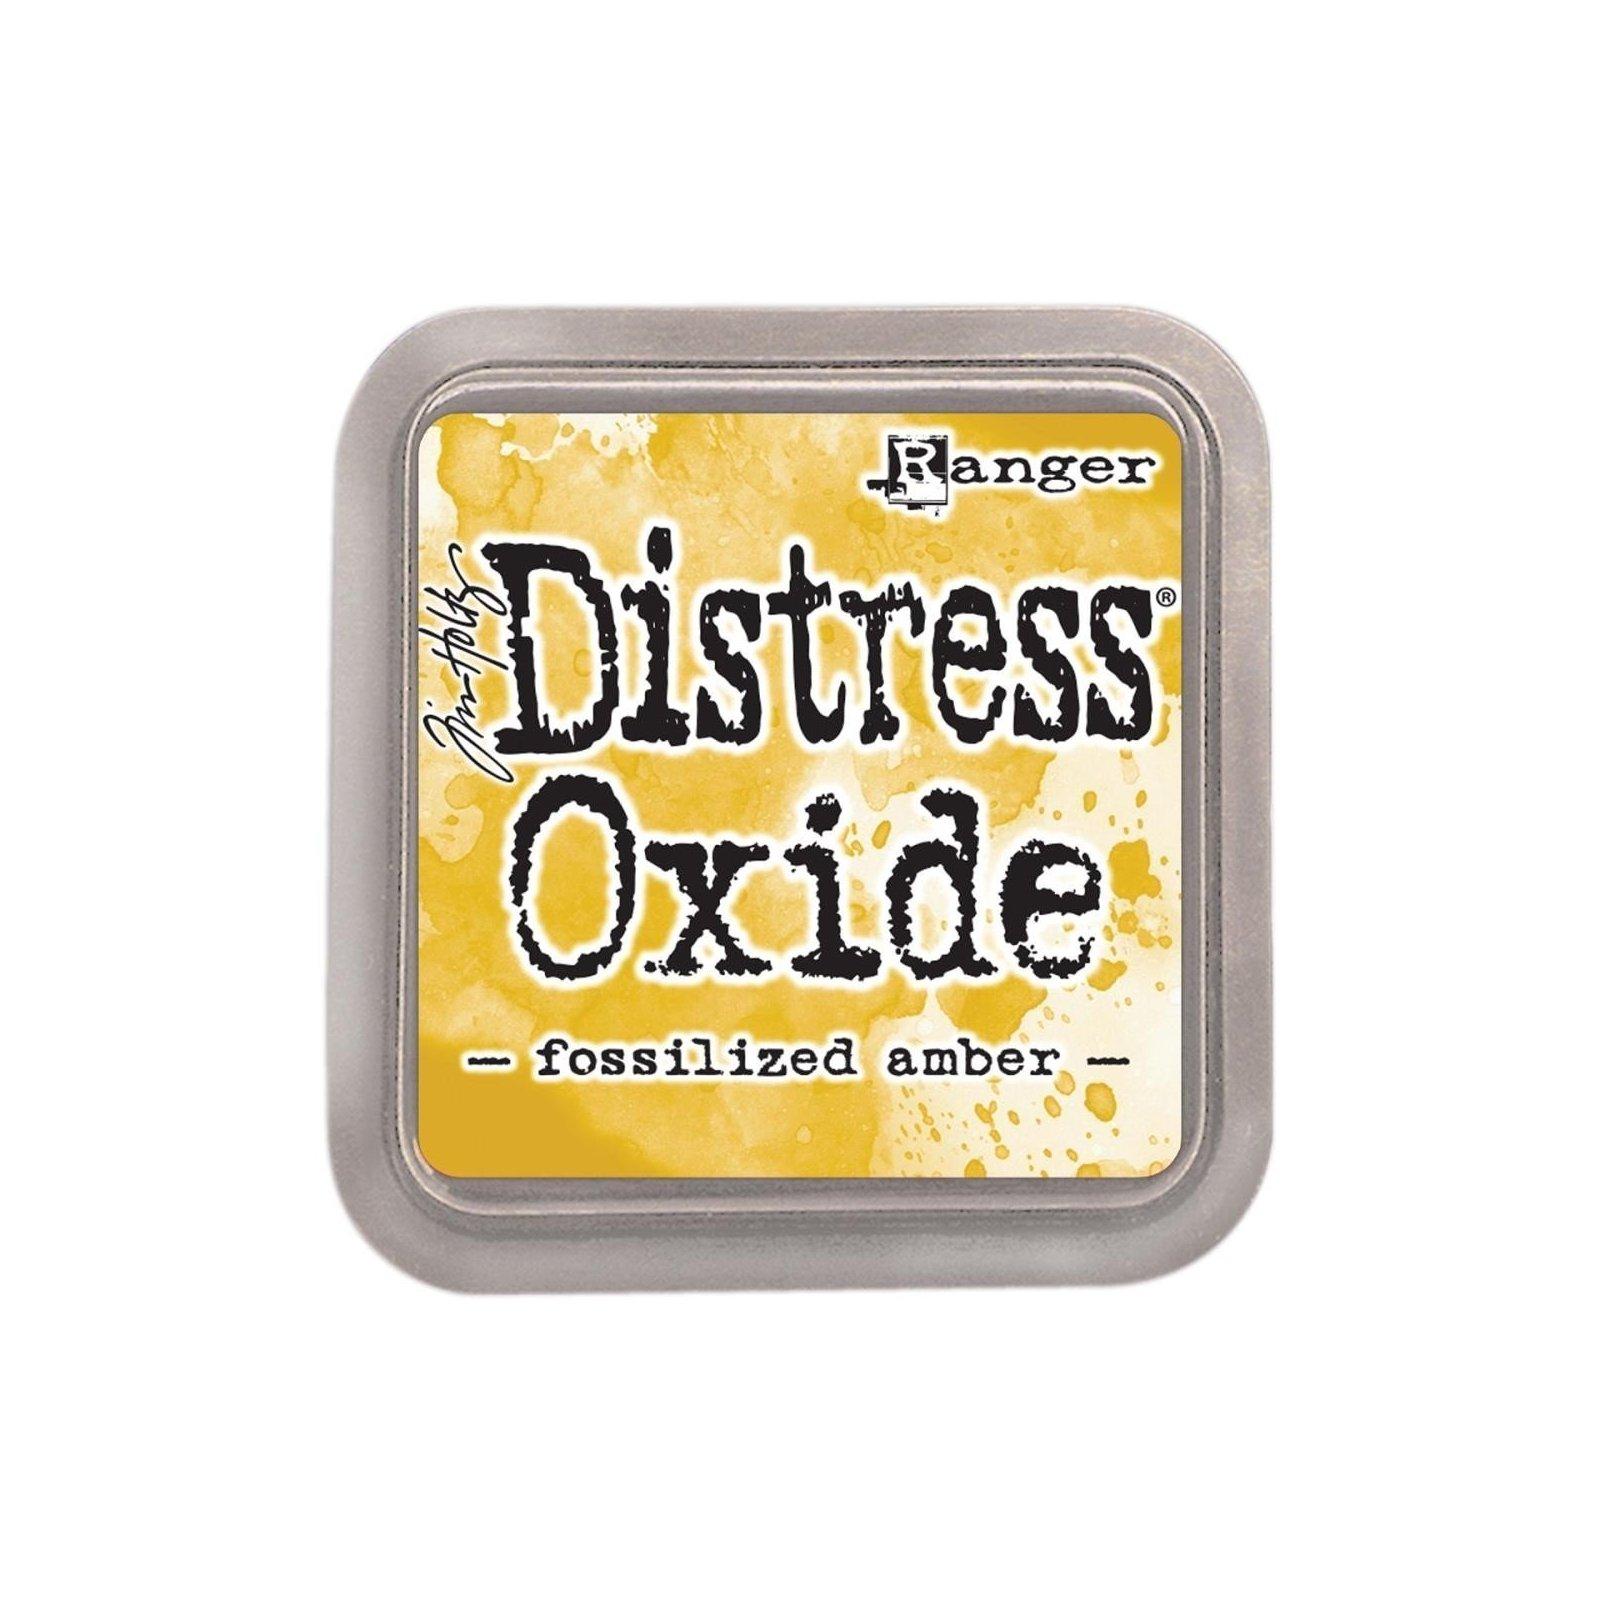 Grand encreur jaune Distress Oxide - Fossilized amber - Ranger